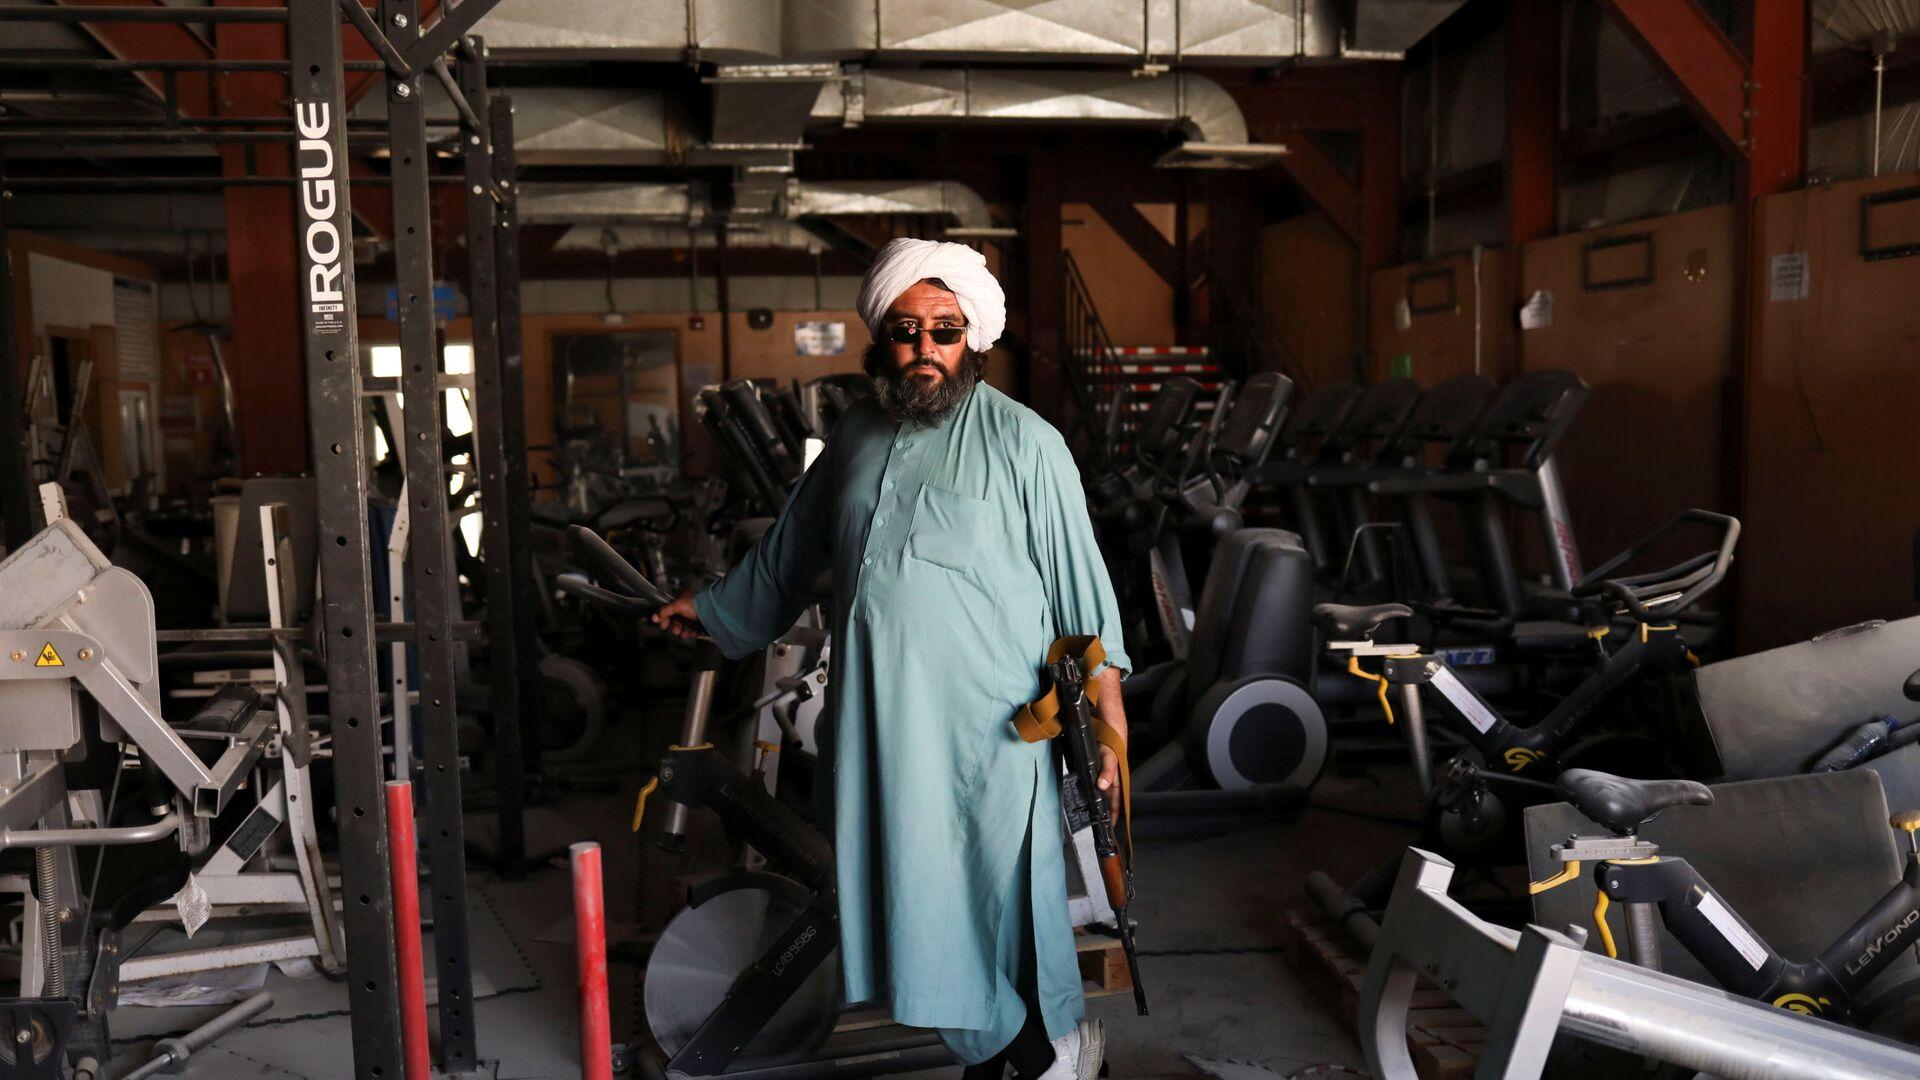 Боевики Талибана* на бывшей американской авиабазе Баграм в Парване, Афганистан - Sputnik Таджикистан, 1920, 12.10.2021